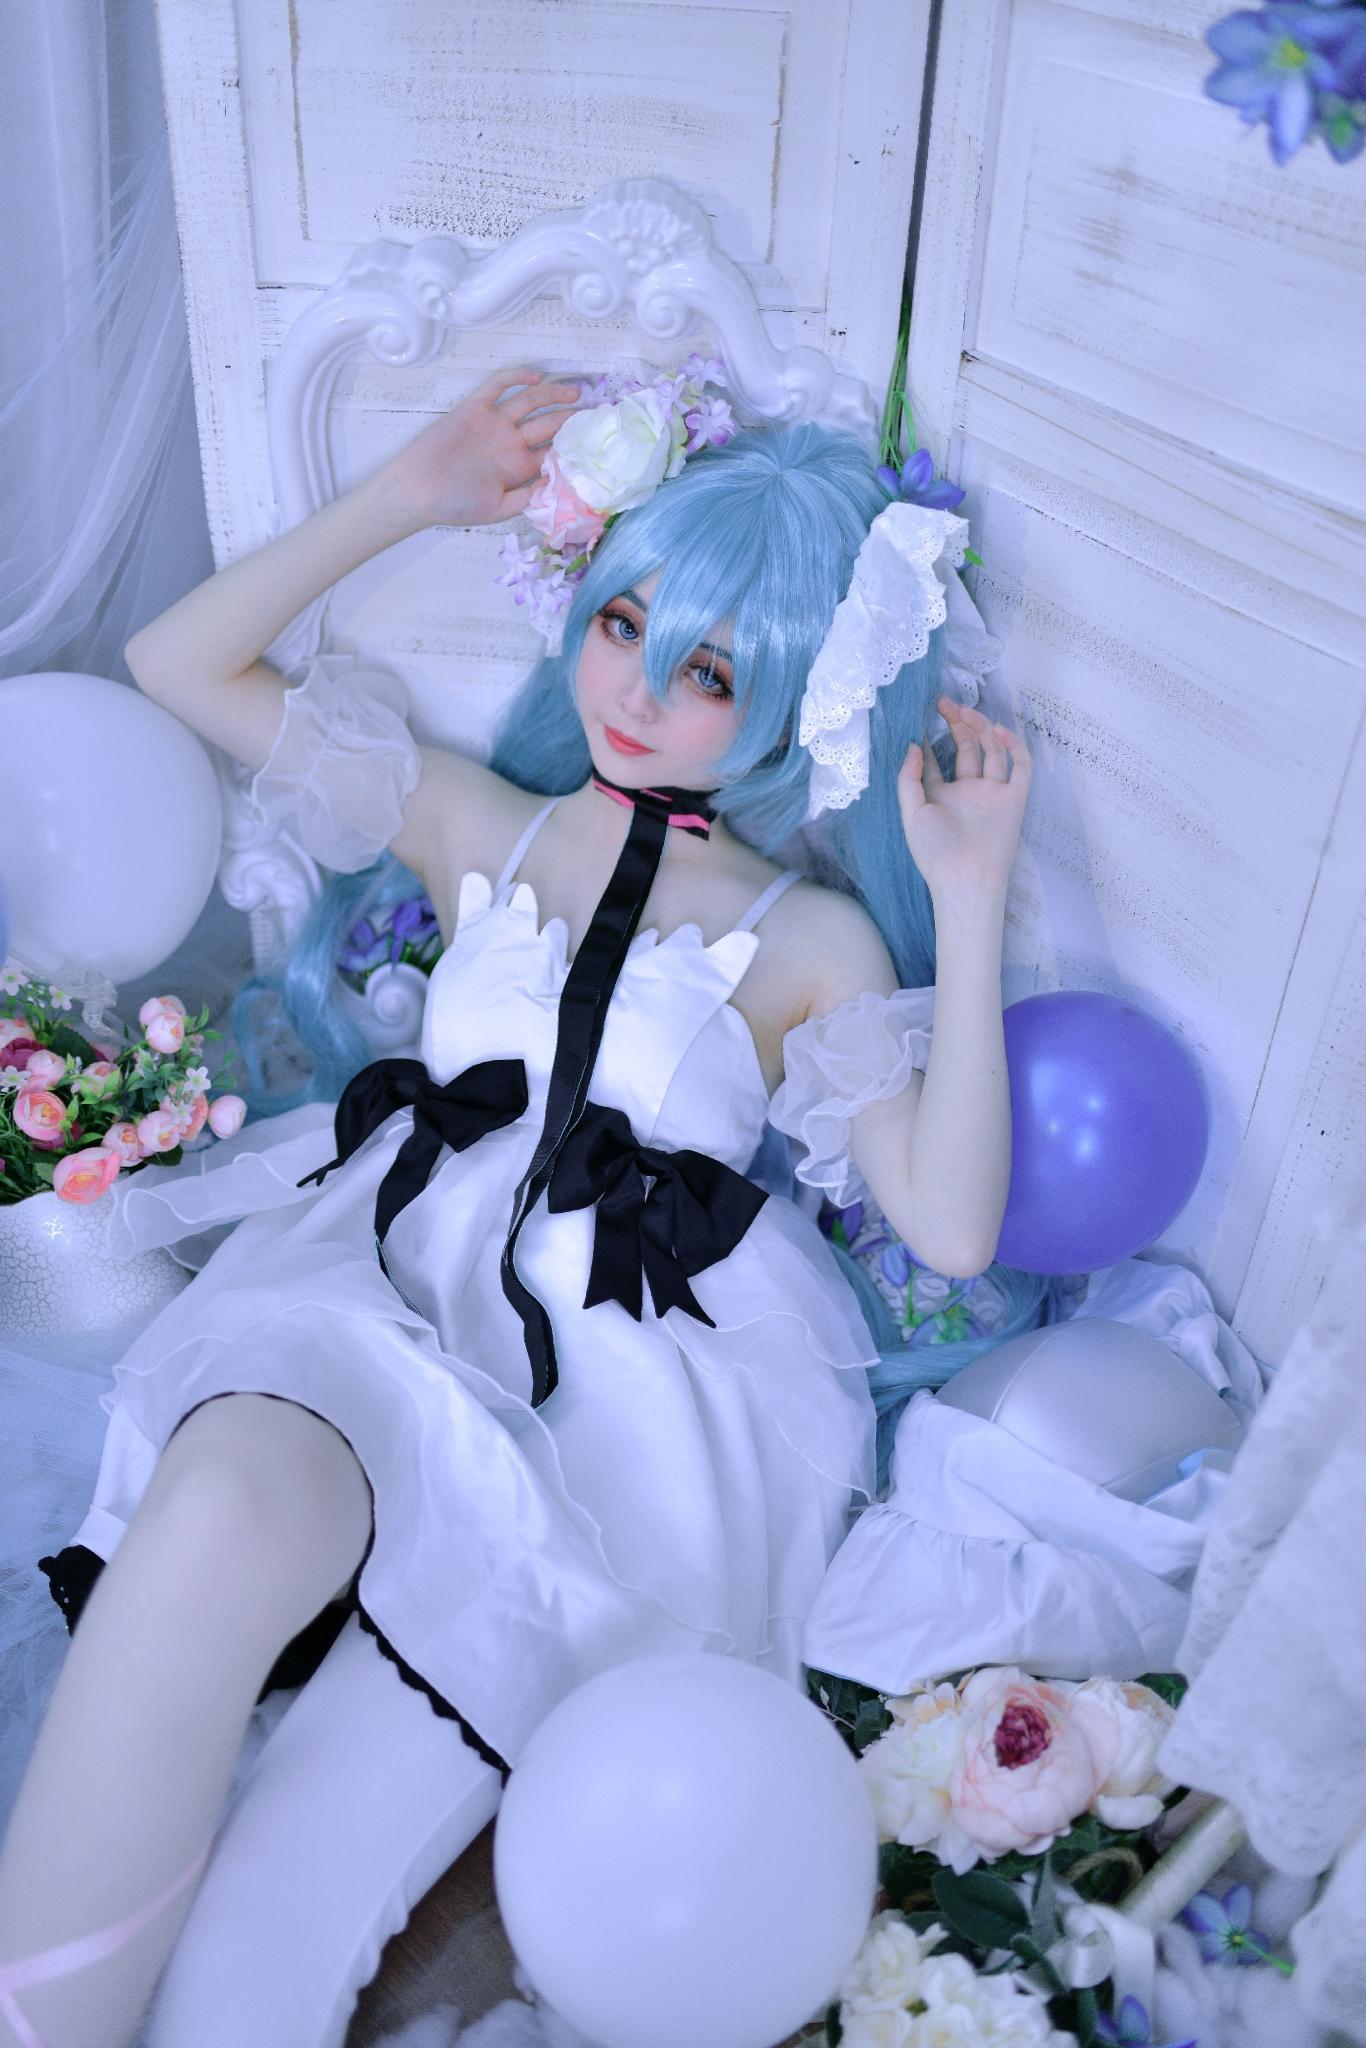 《VOCALOID》精灵cosplay【CN:果锅_LEH】-第2张